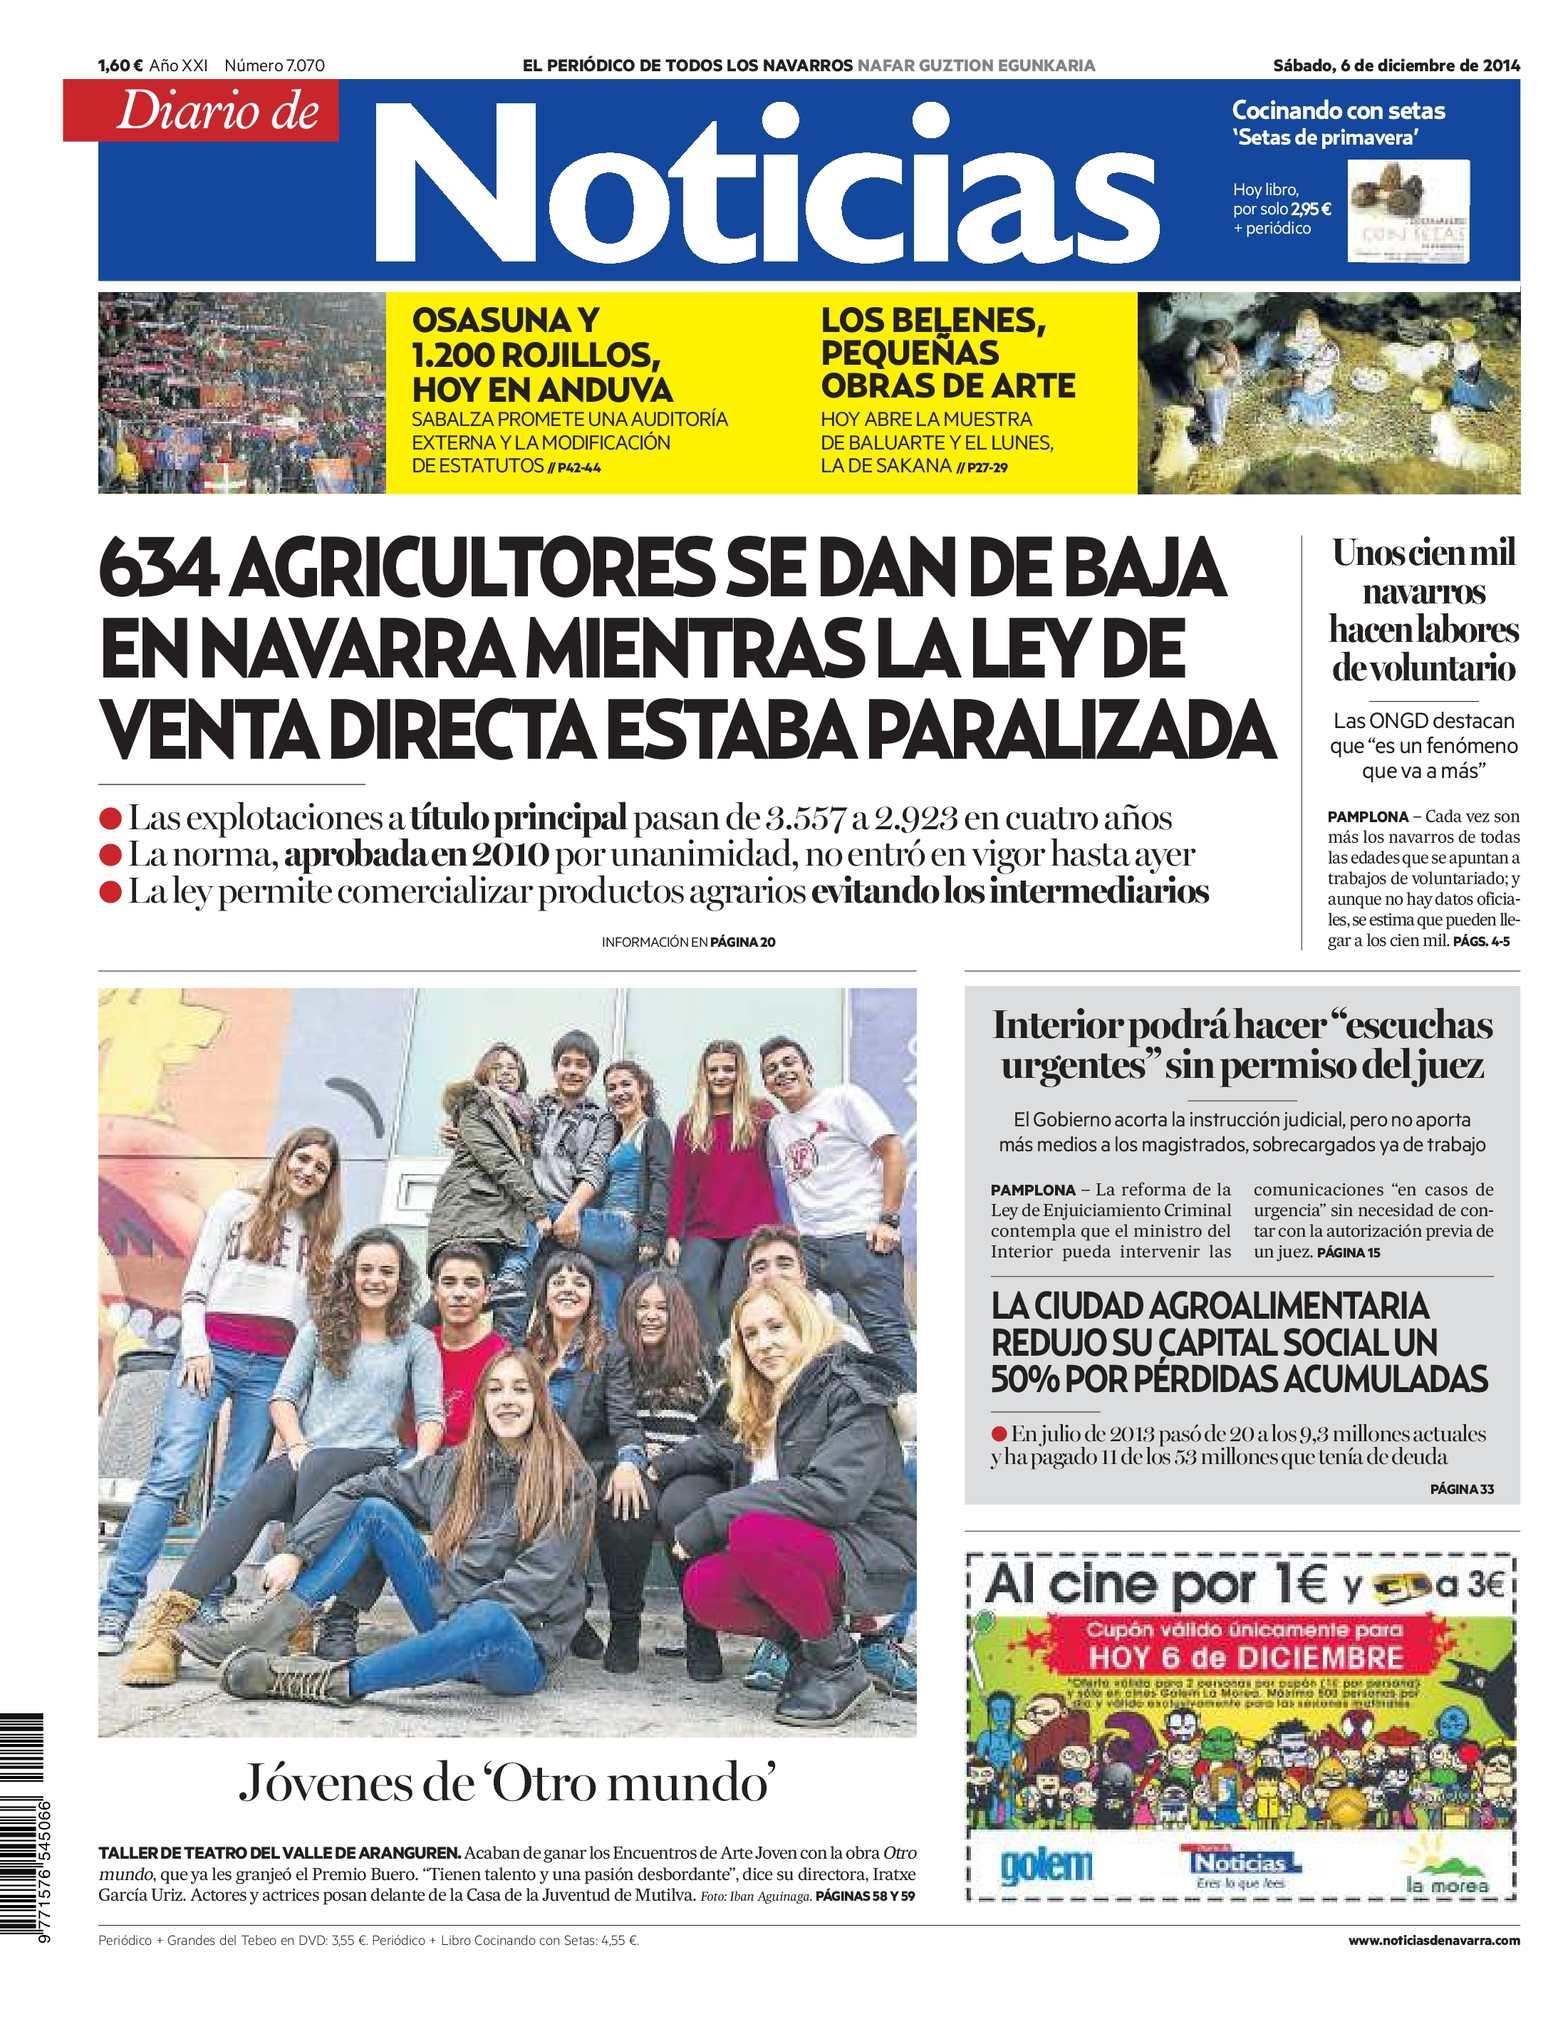 Musas Del Porno Anos 60 calaméo - diario de noticias 20141206